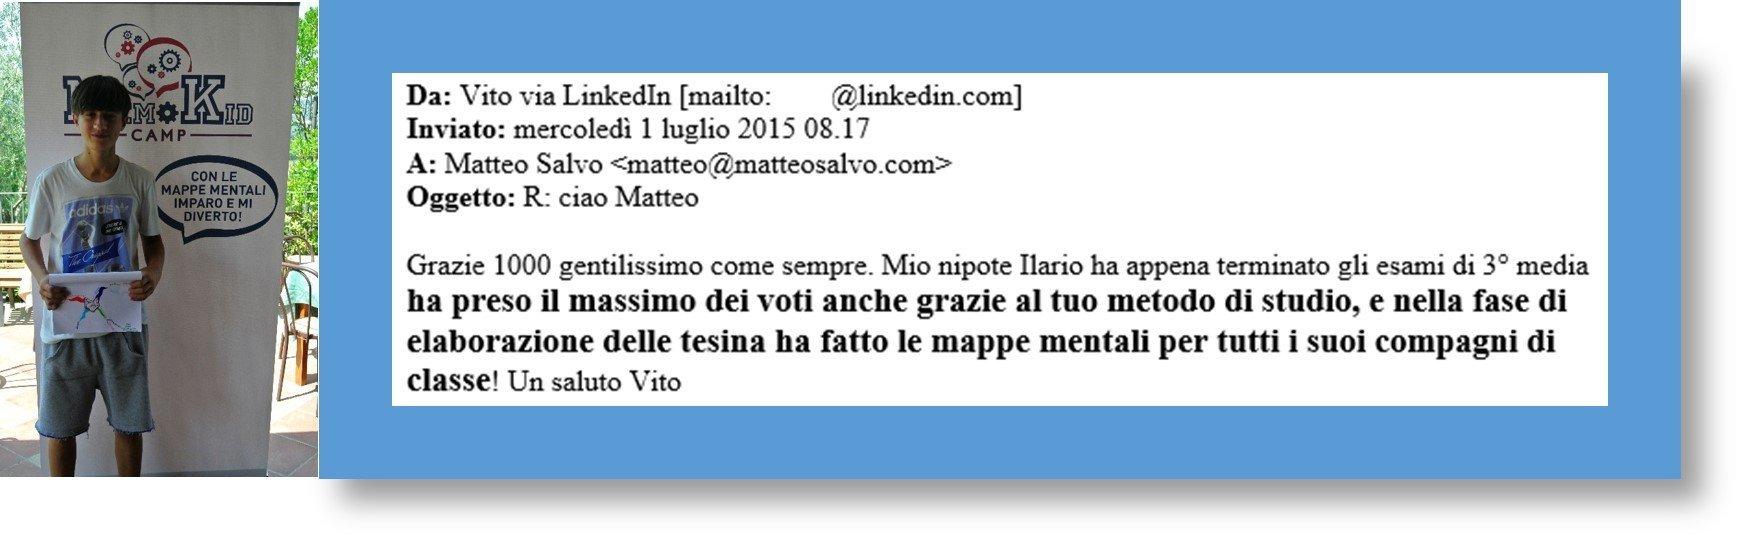 mail14